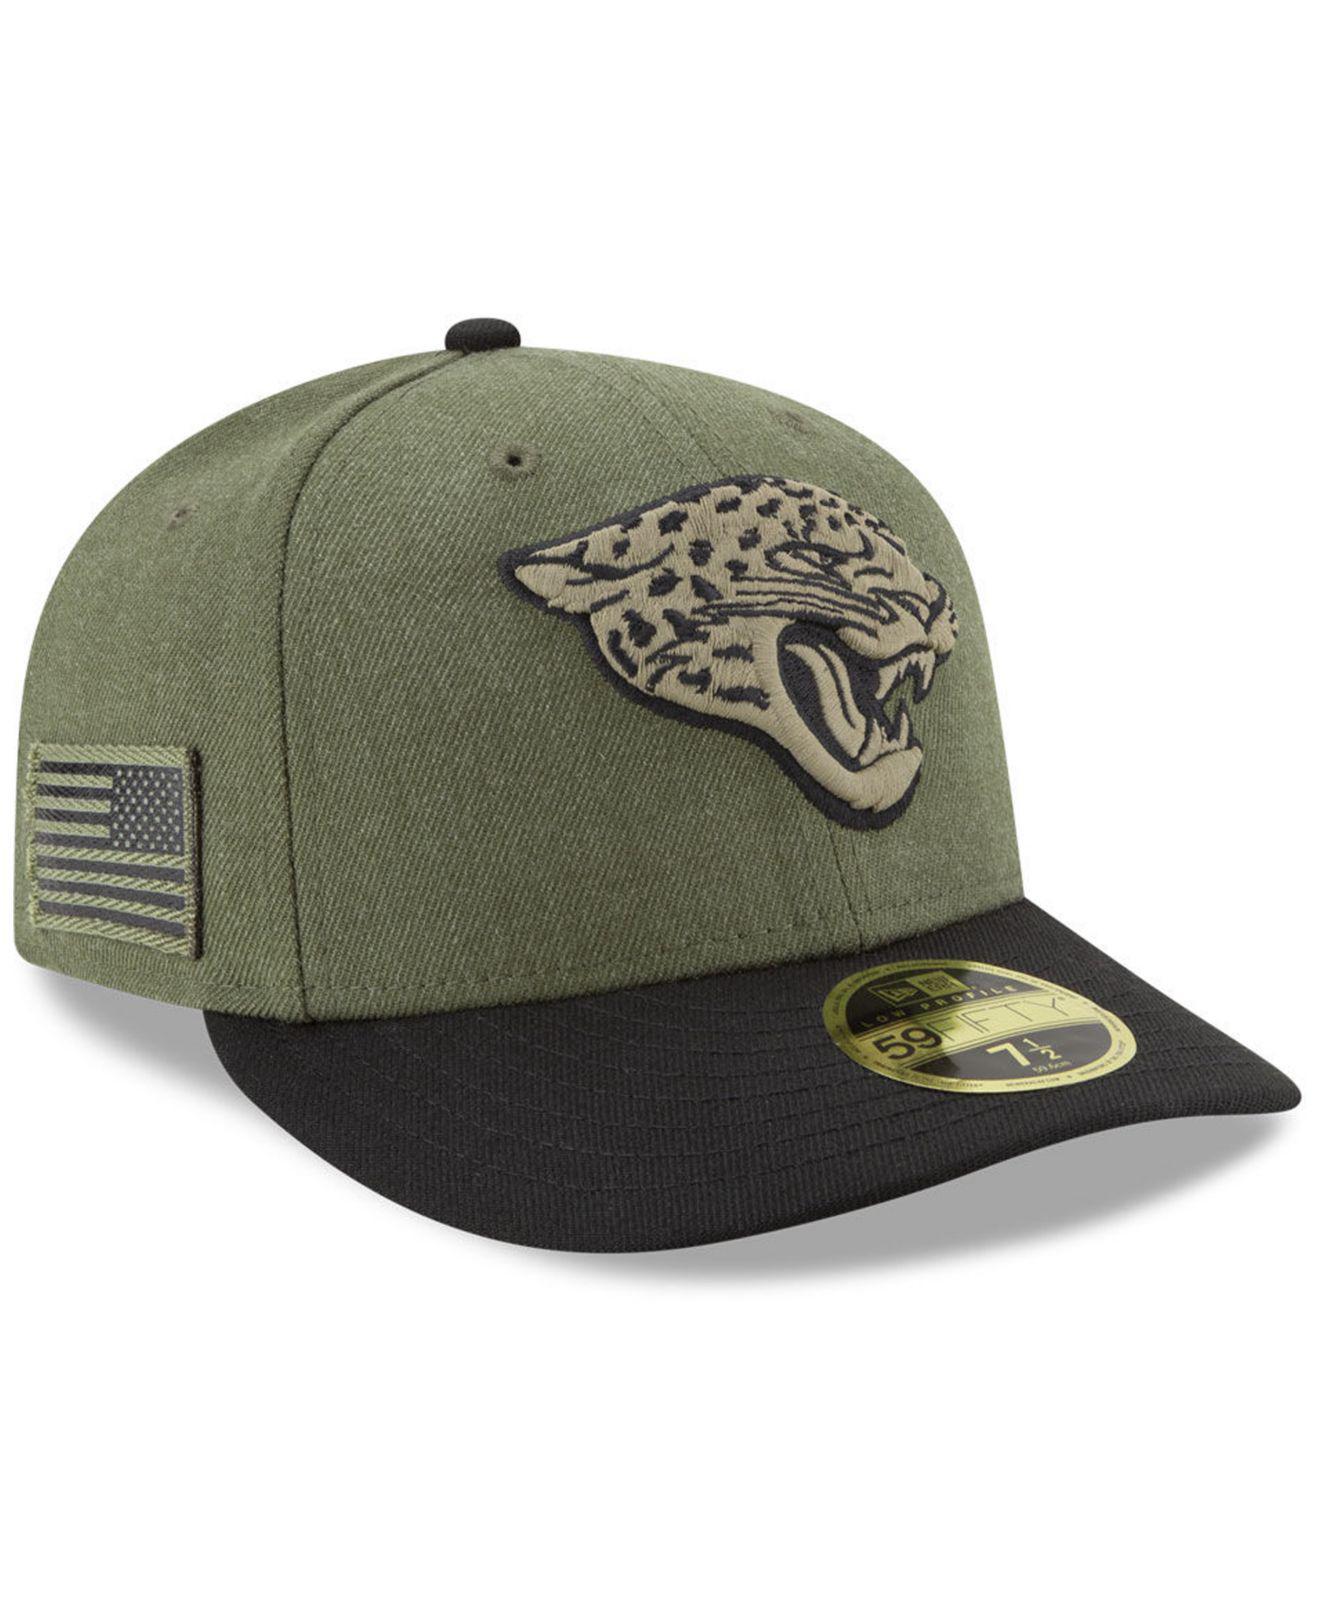 Lyst - KTZ Jacksonville Jaguars Salute To Service Low Profile ... 64c9470f0